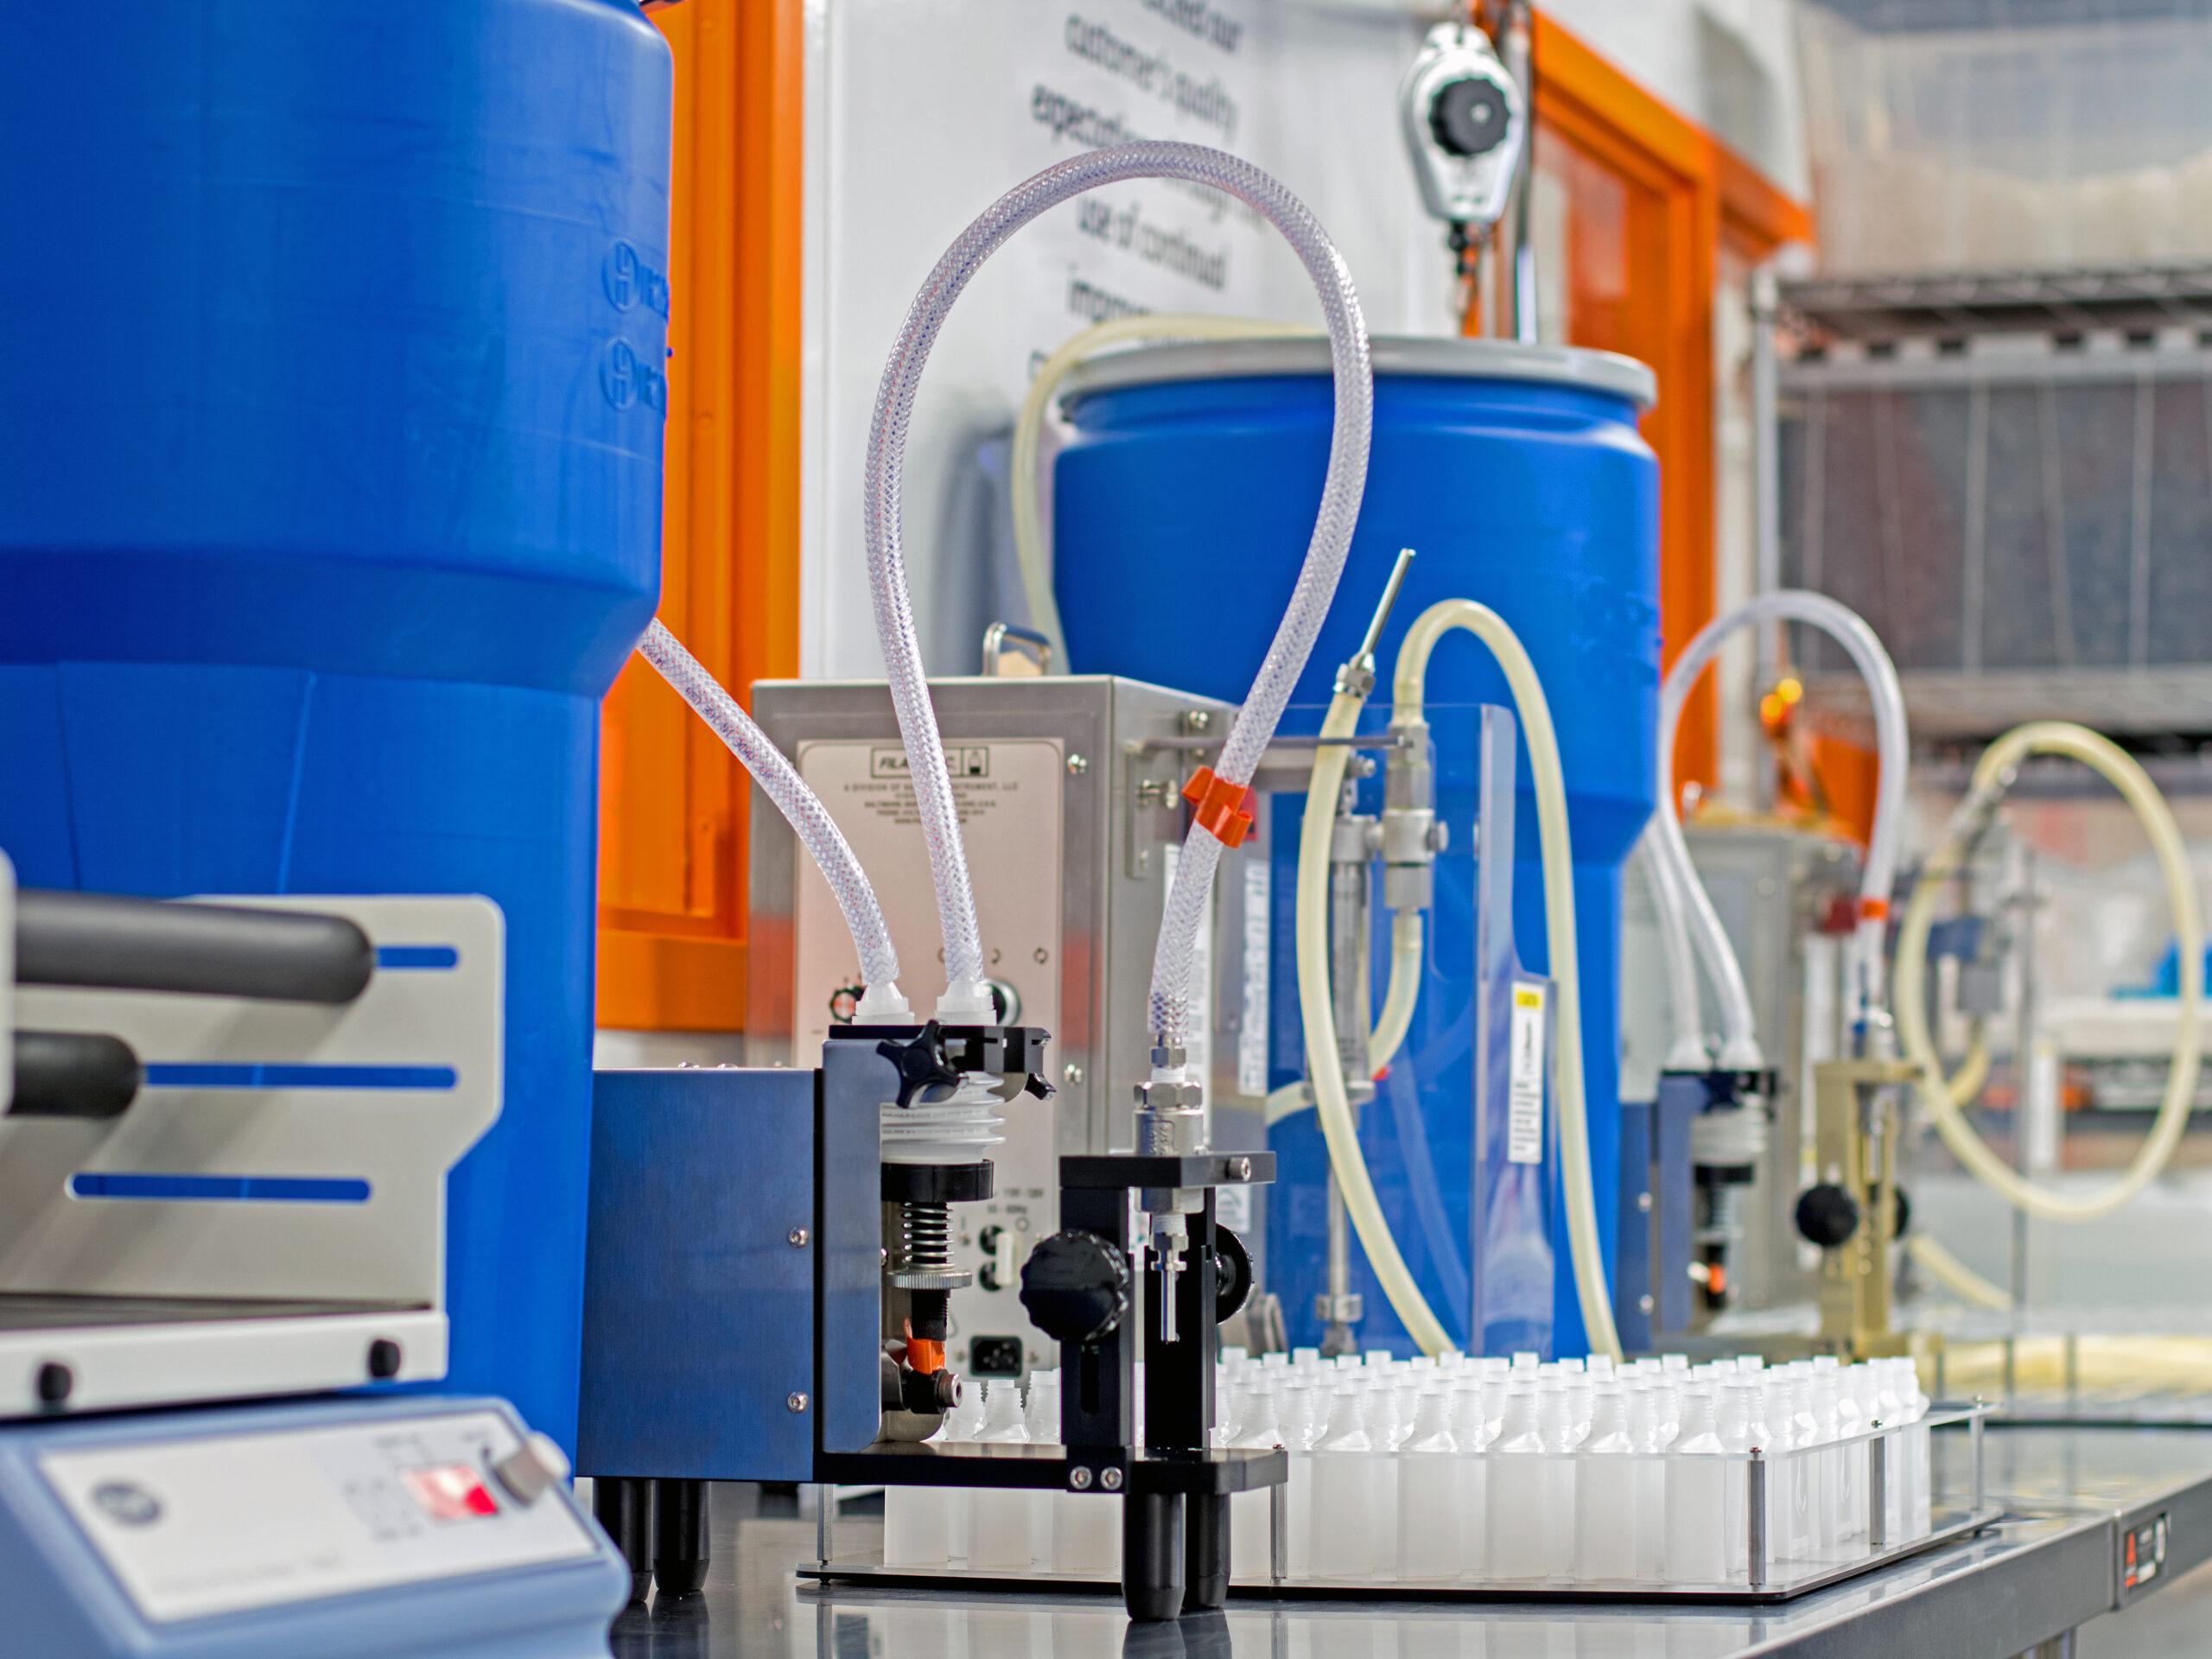 Mister-E-Liquid vape juice pumps